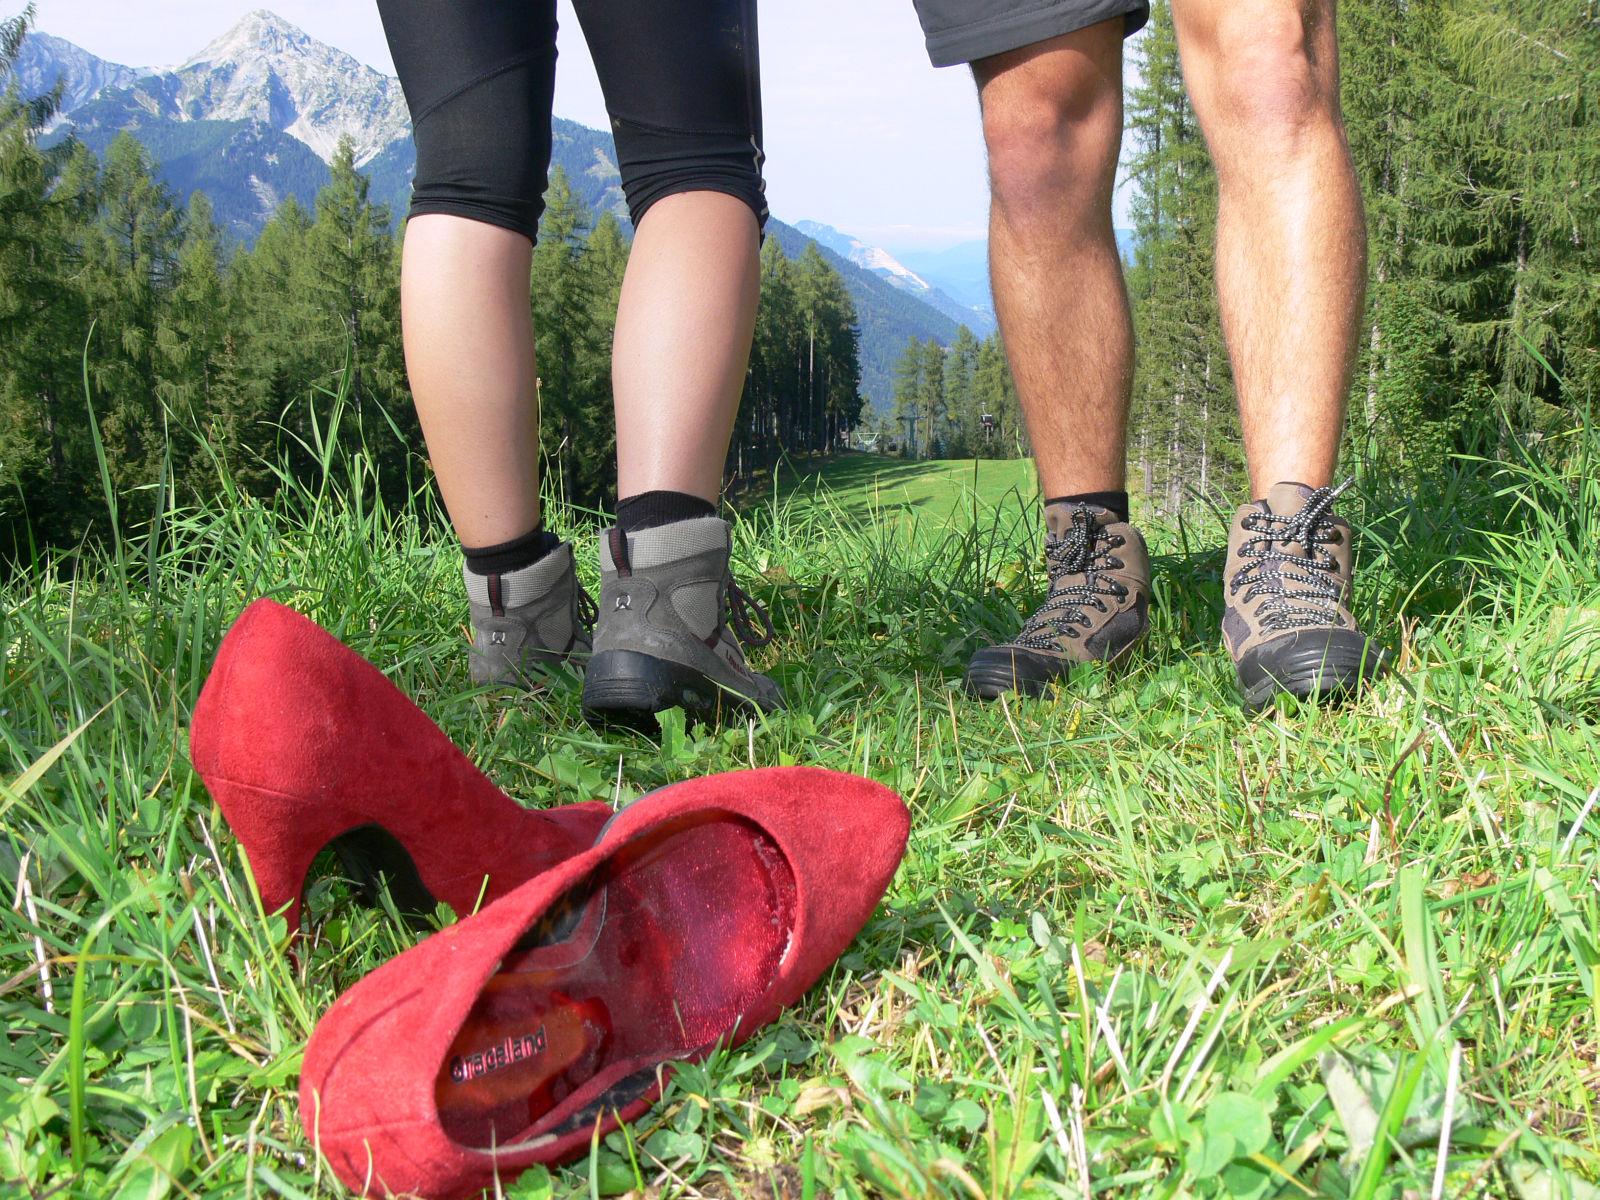 Kontakt partnervermittlung aus molln - Single urlaub in leoben